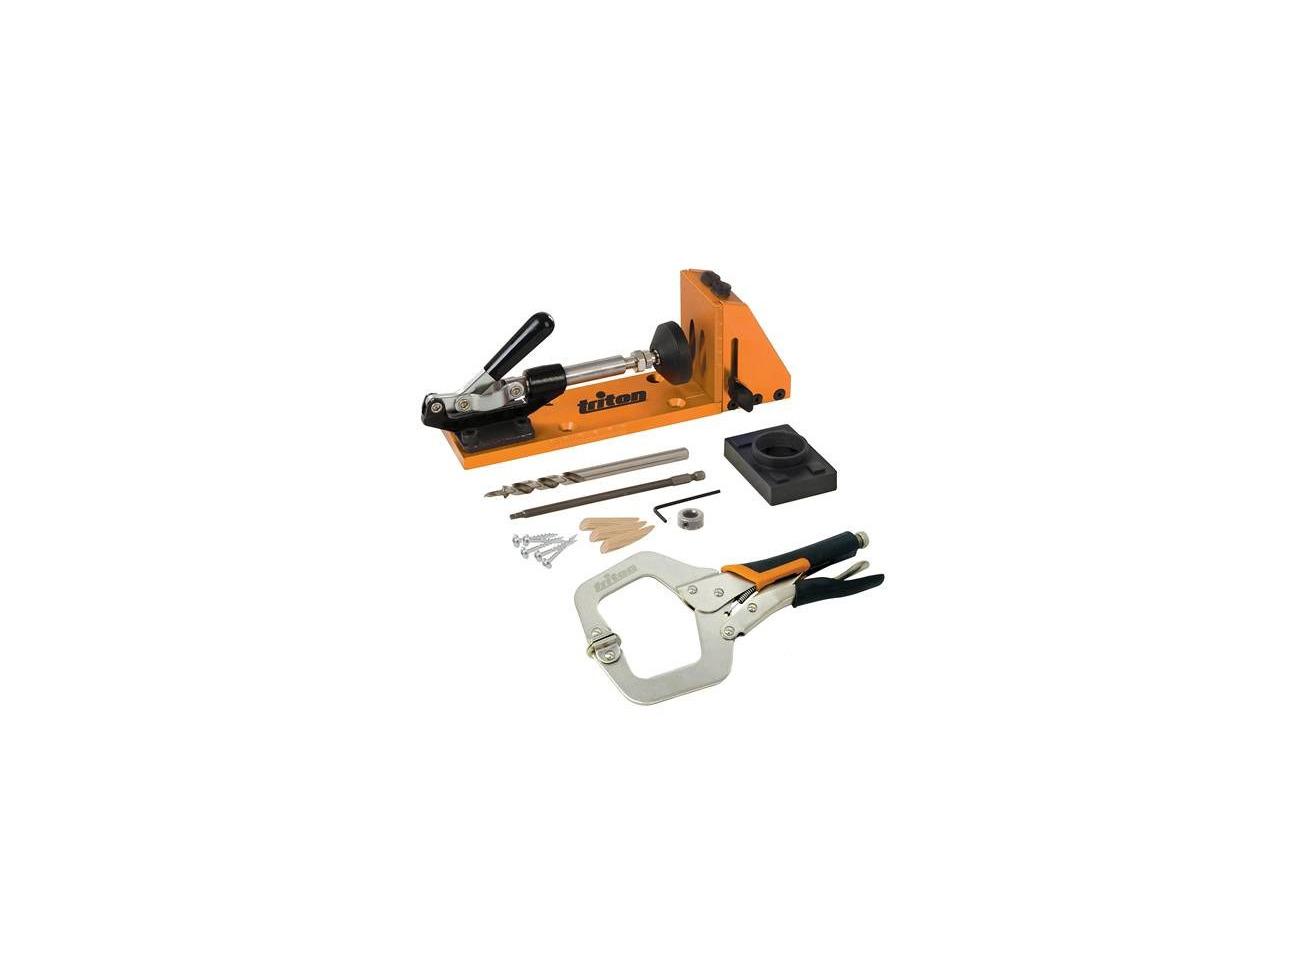 Triton Clamping Pocket-Hole Bench Jig Kit Clamp Screws Plugs /& Drive Bit TW8CPHJ